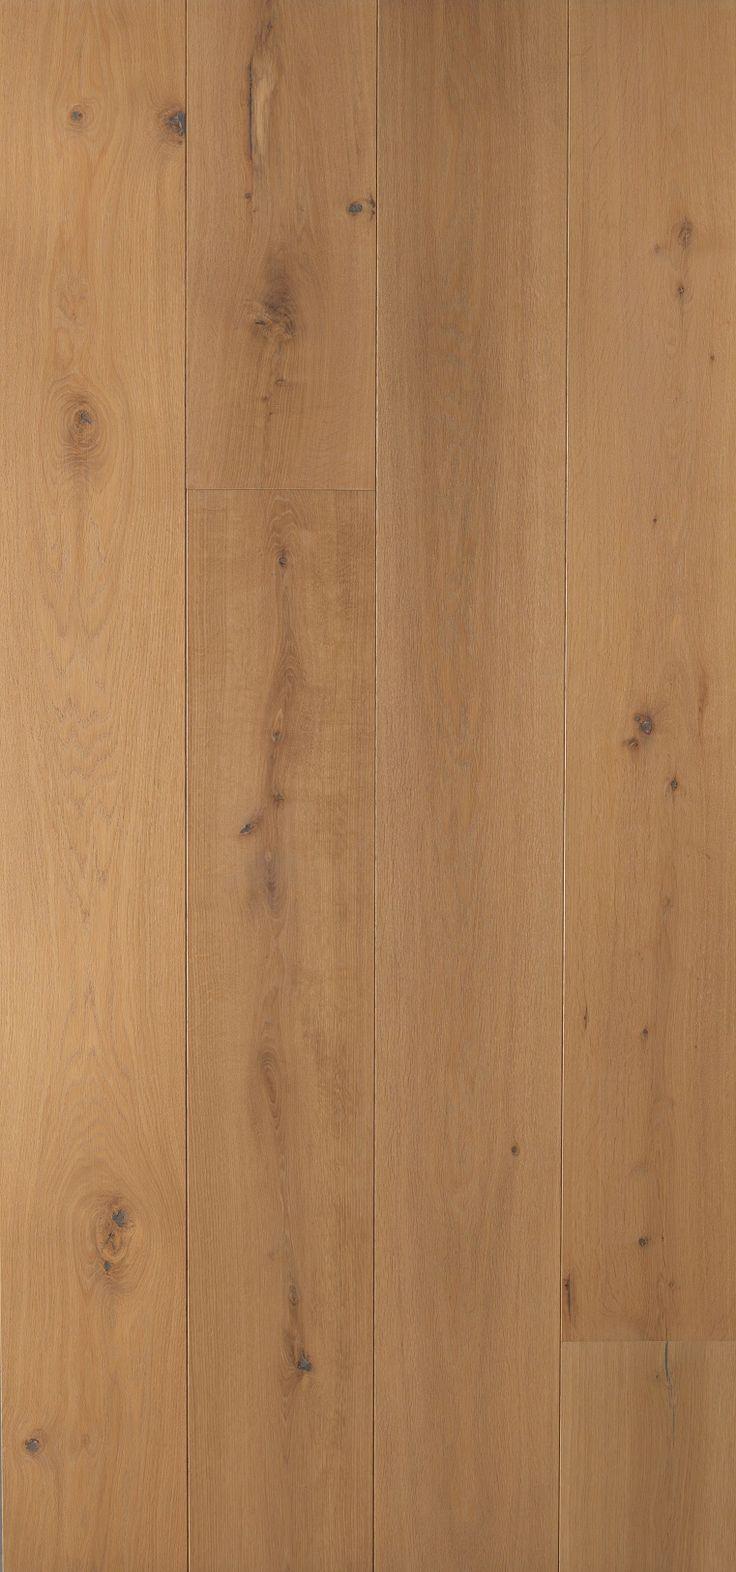 Eiken duoplank, wit geolied. Natural collectie: NEBRASKA 26 cm breed